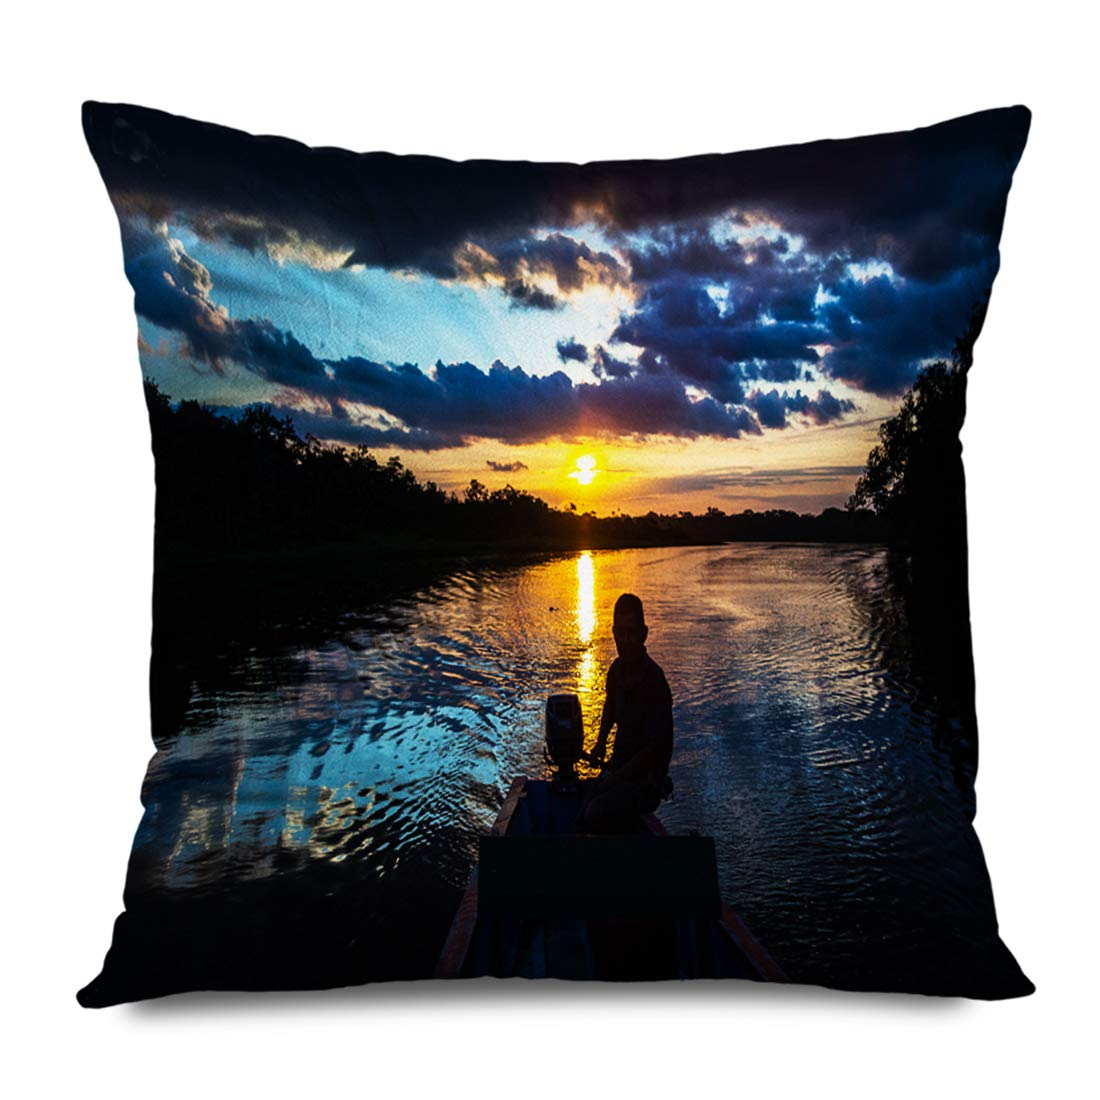 Ahawoso Throw Pillow Cover Square 18x18 Inches Green Canoe Reflection Sun Sunset Limoncocha Lagoon Ecuadorian Nature Bird Red Adventure Amazonian Decorative Zipper Pillowcase Home Decor Cushion Case